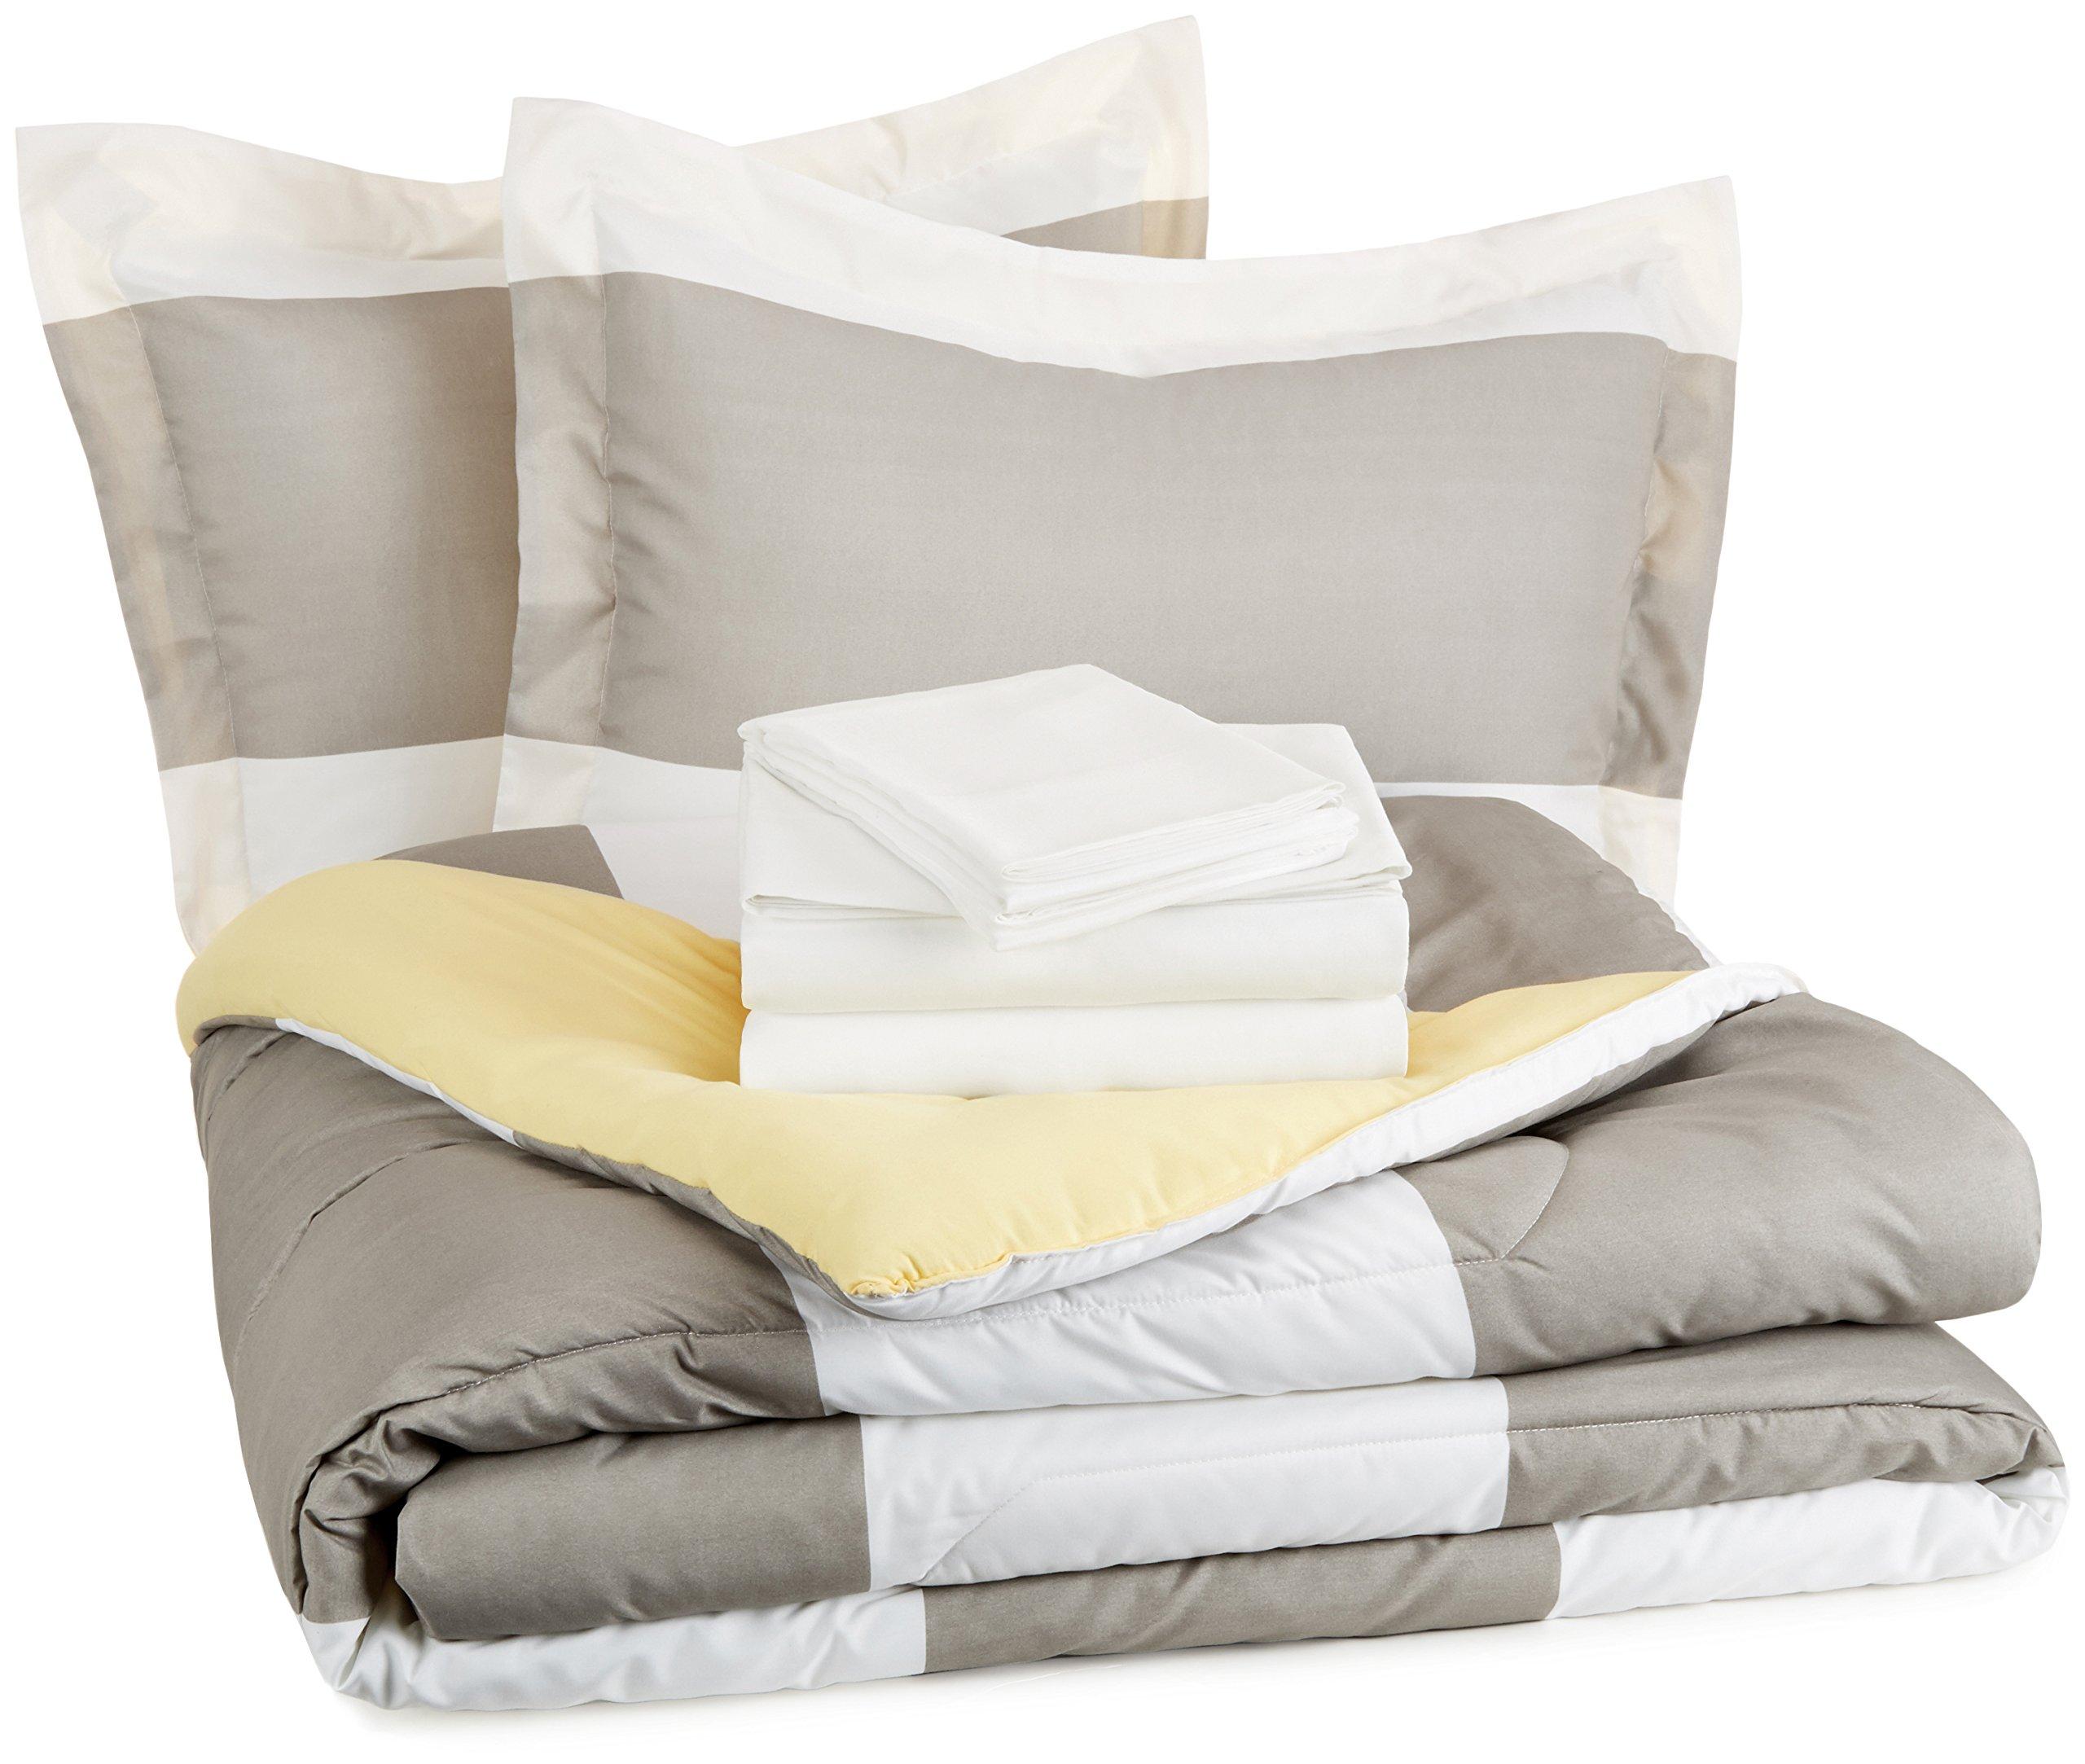 AmazonBasics 7 Piece Bed Bag Reversible